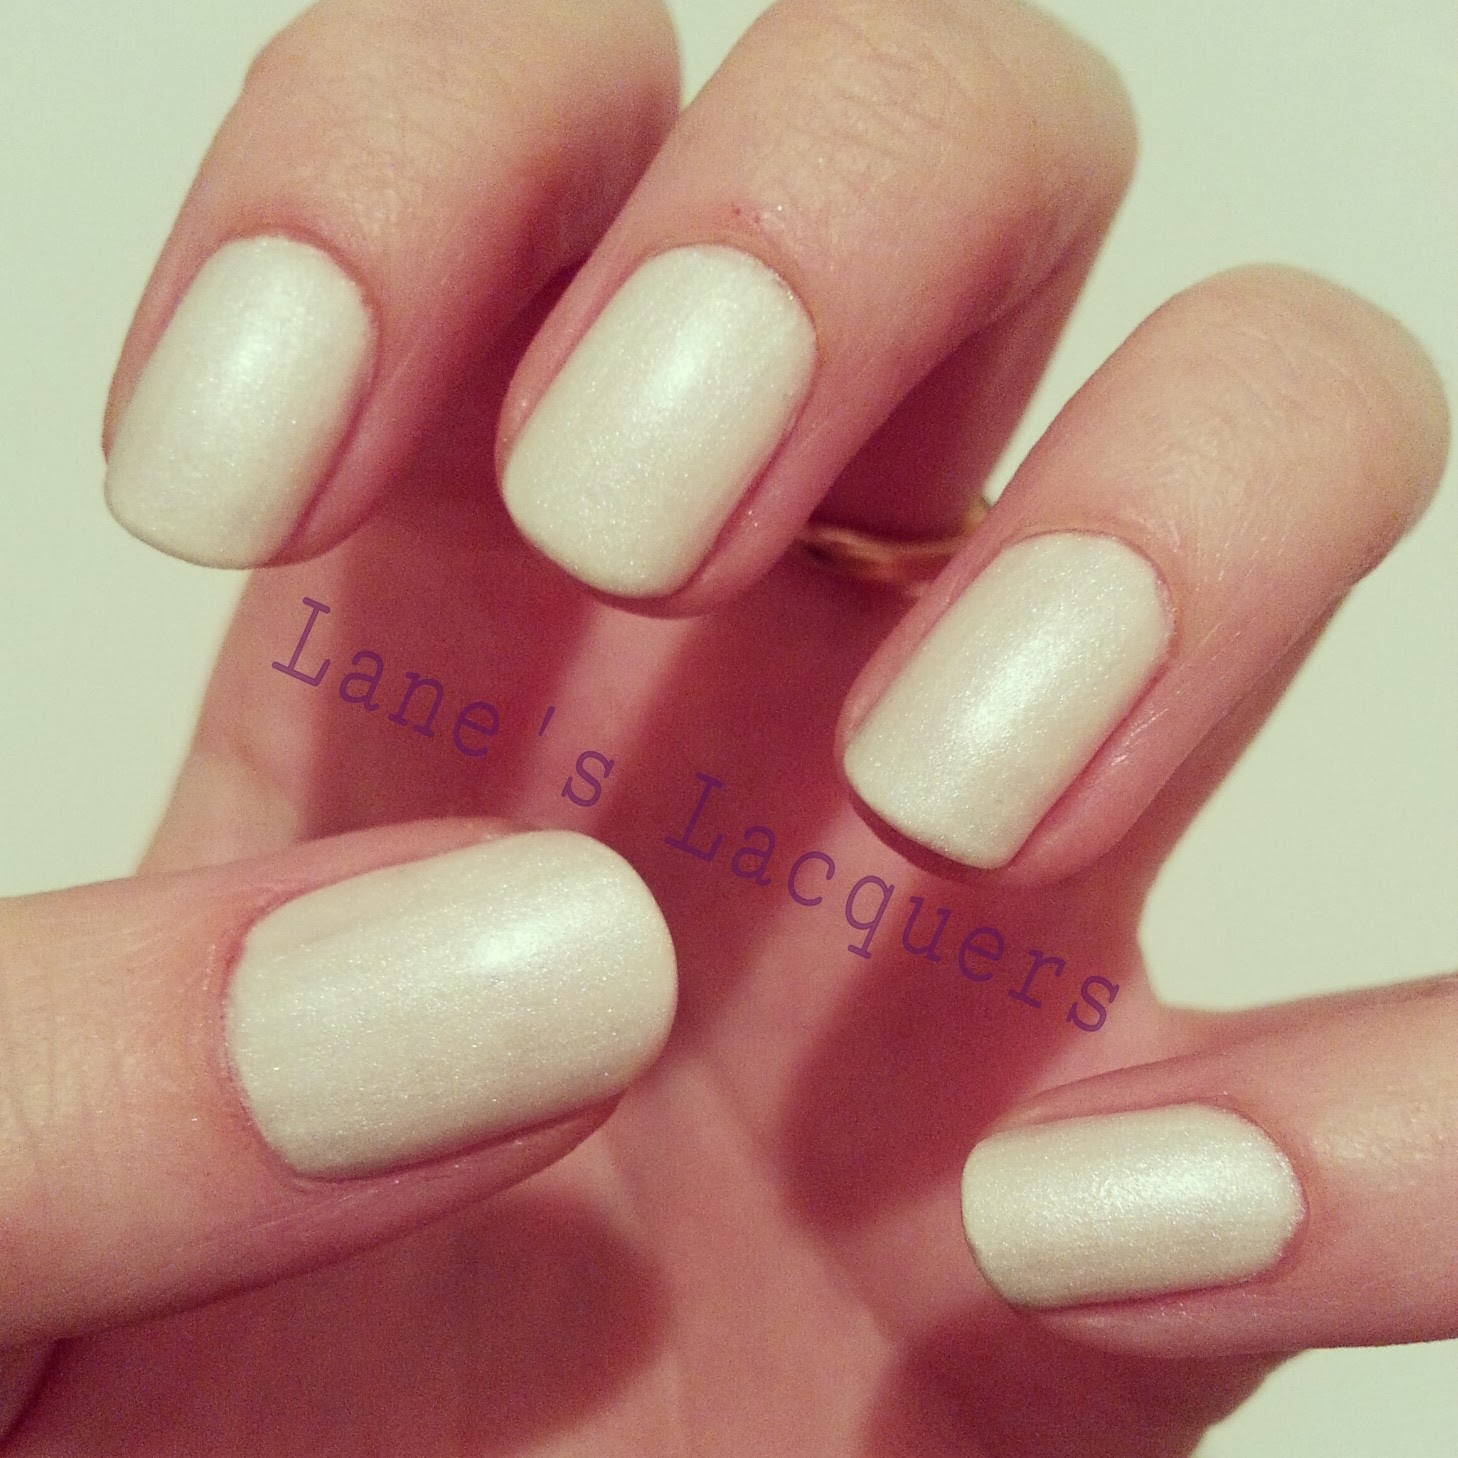 barry-m-silk-pearl-swatch-manicure